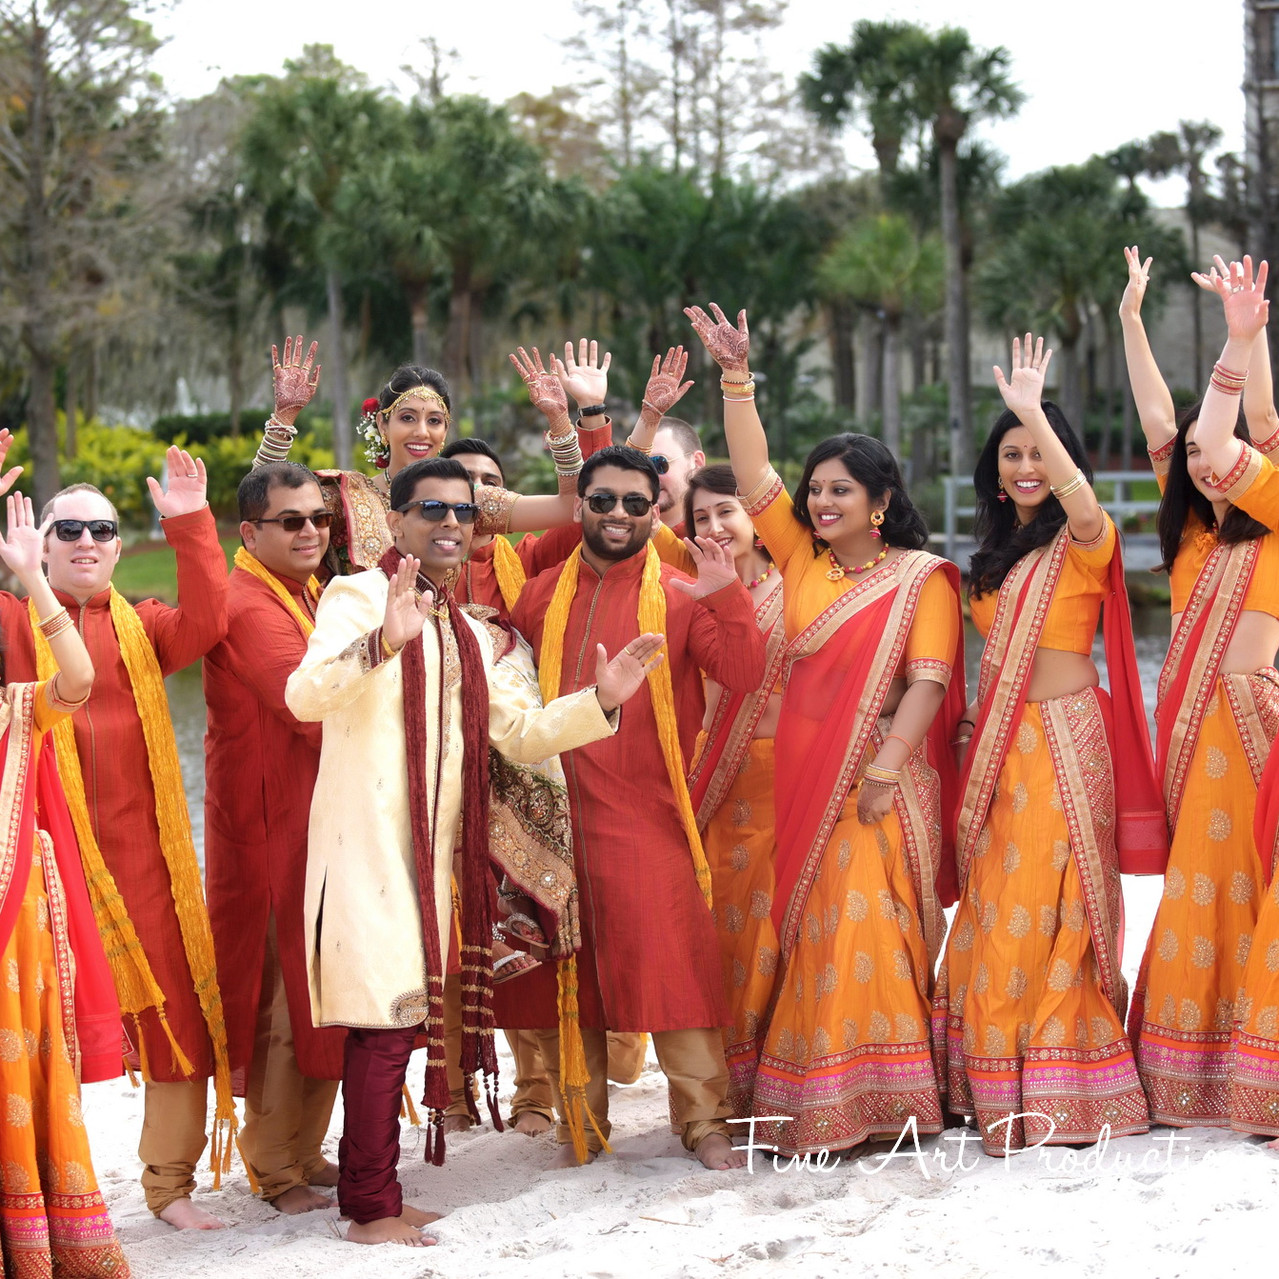 Hyatt-Regency-Grand-Cypress-Indian-Wedding-Photography-Fine-Art-Production-Amish-Thakkar_34